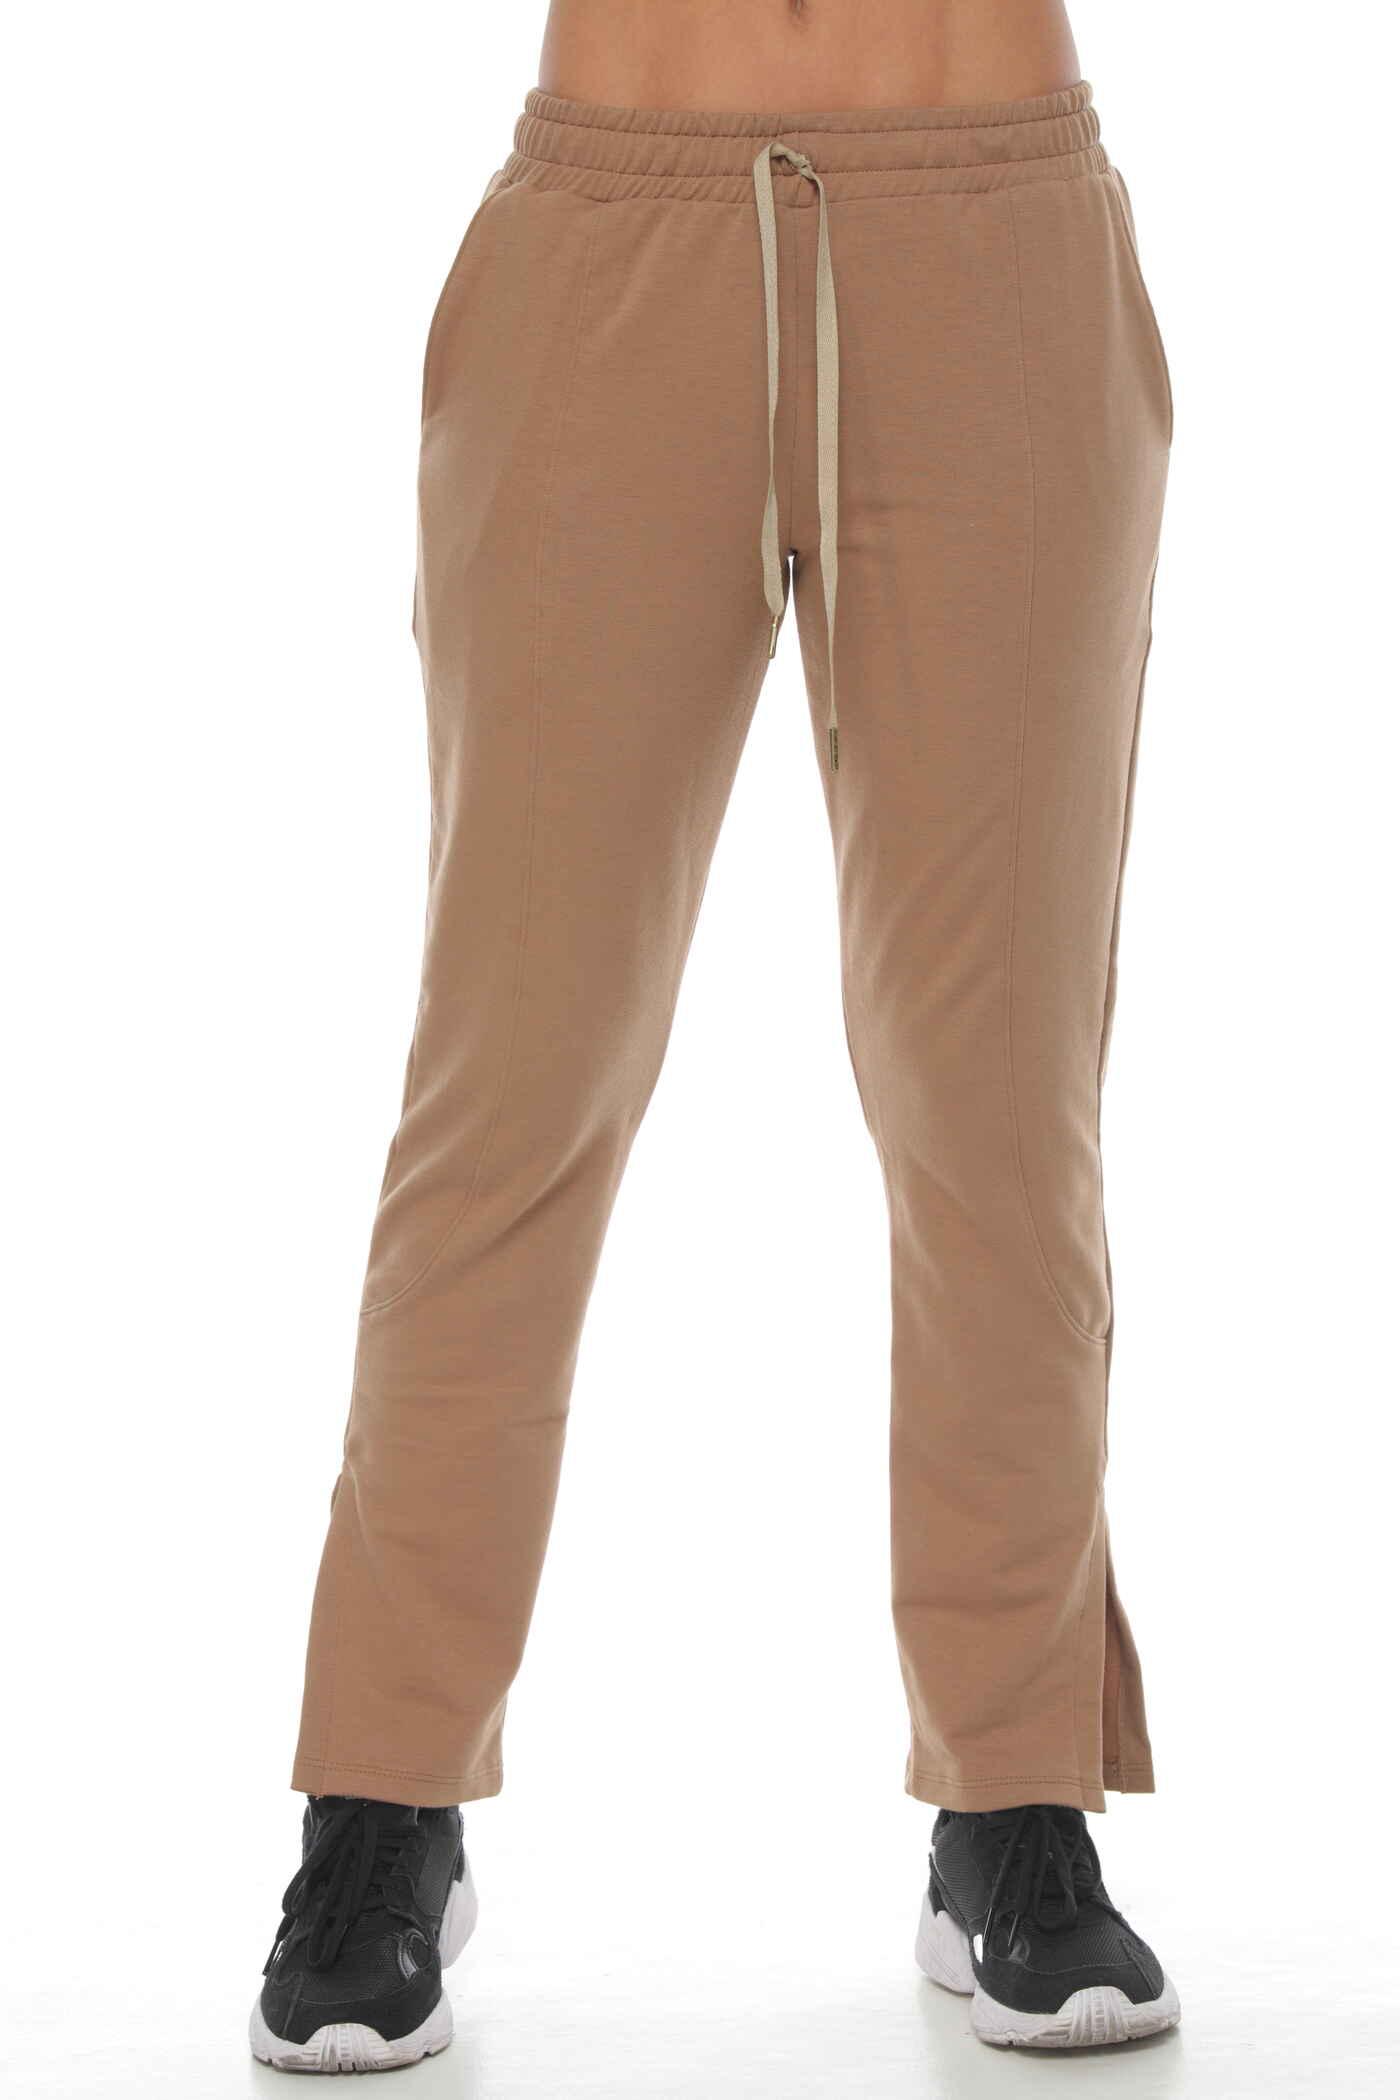 Pantalon Largo Dama   240422